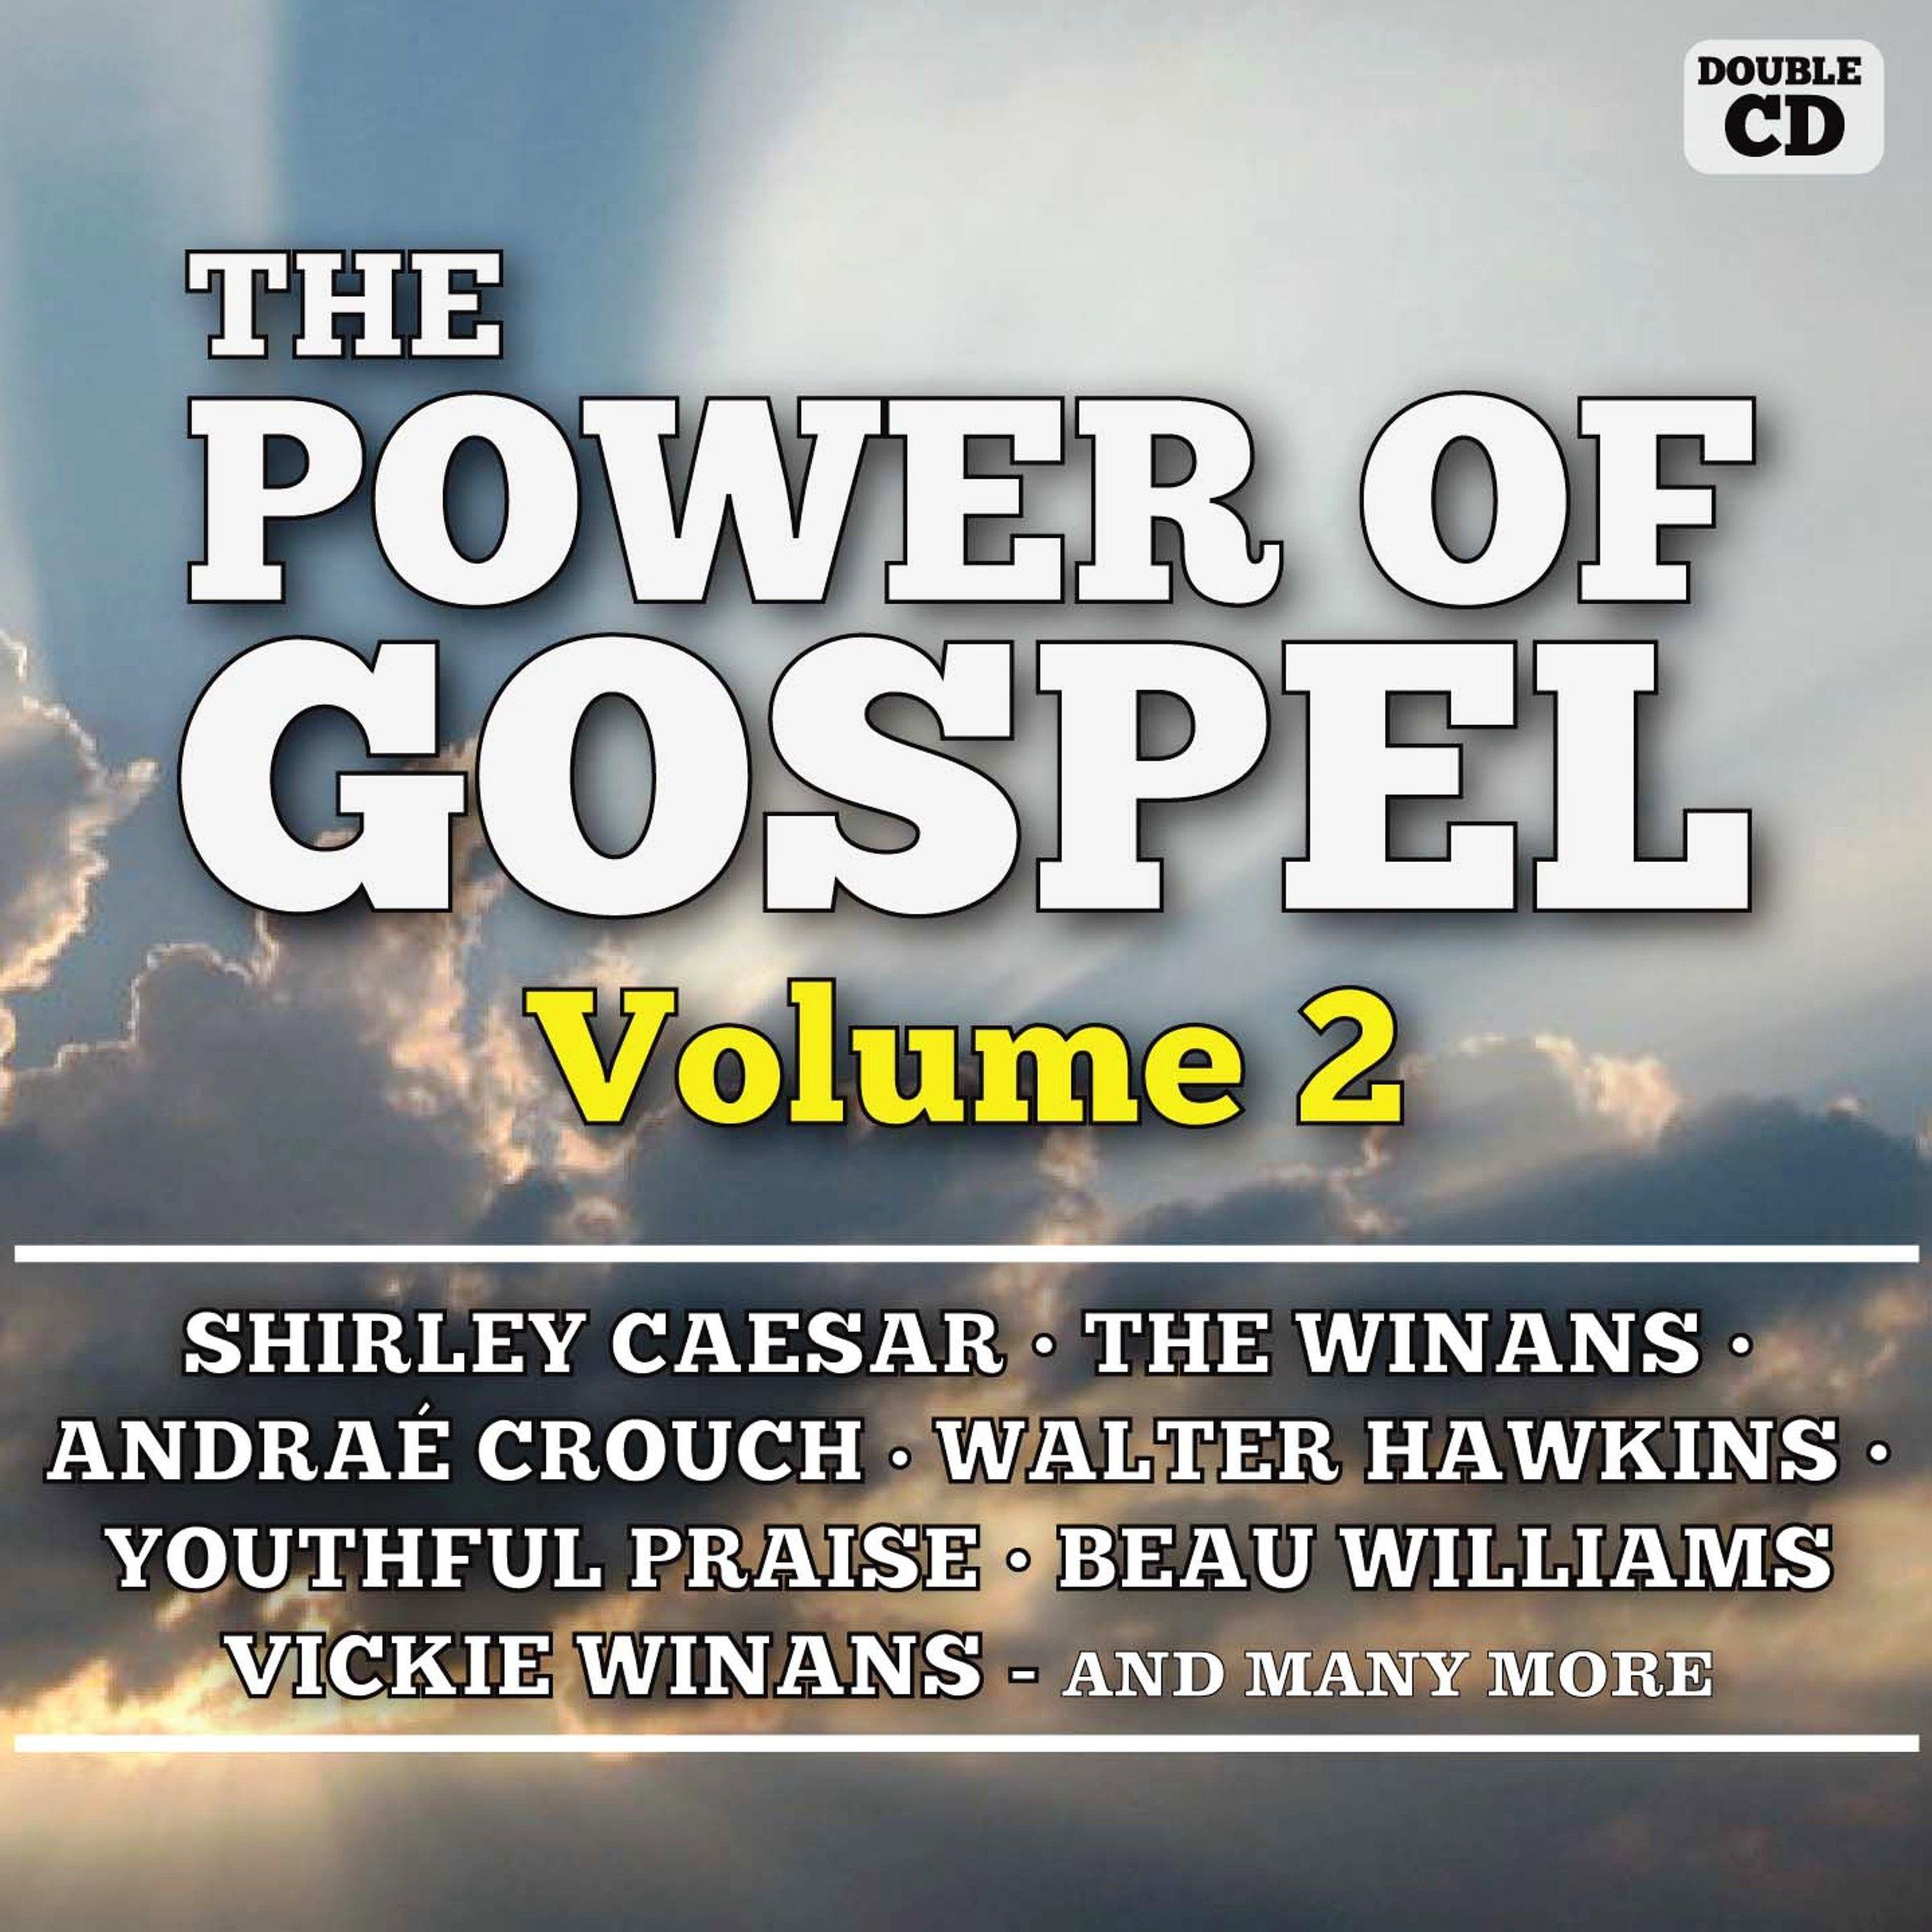 The Power Of Gospel Vol 2